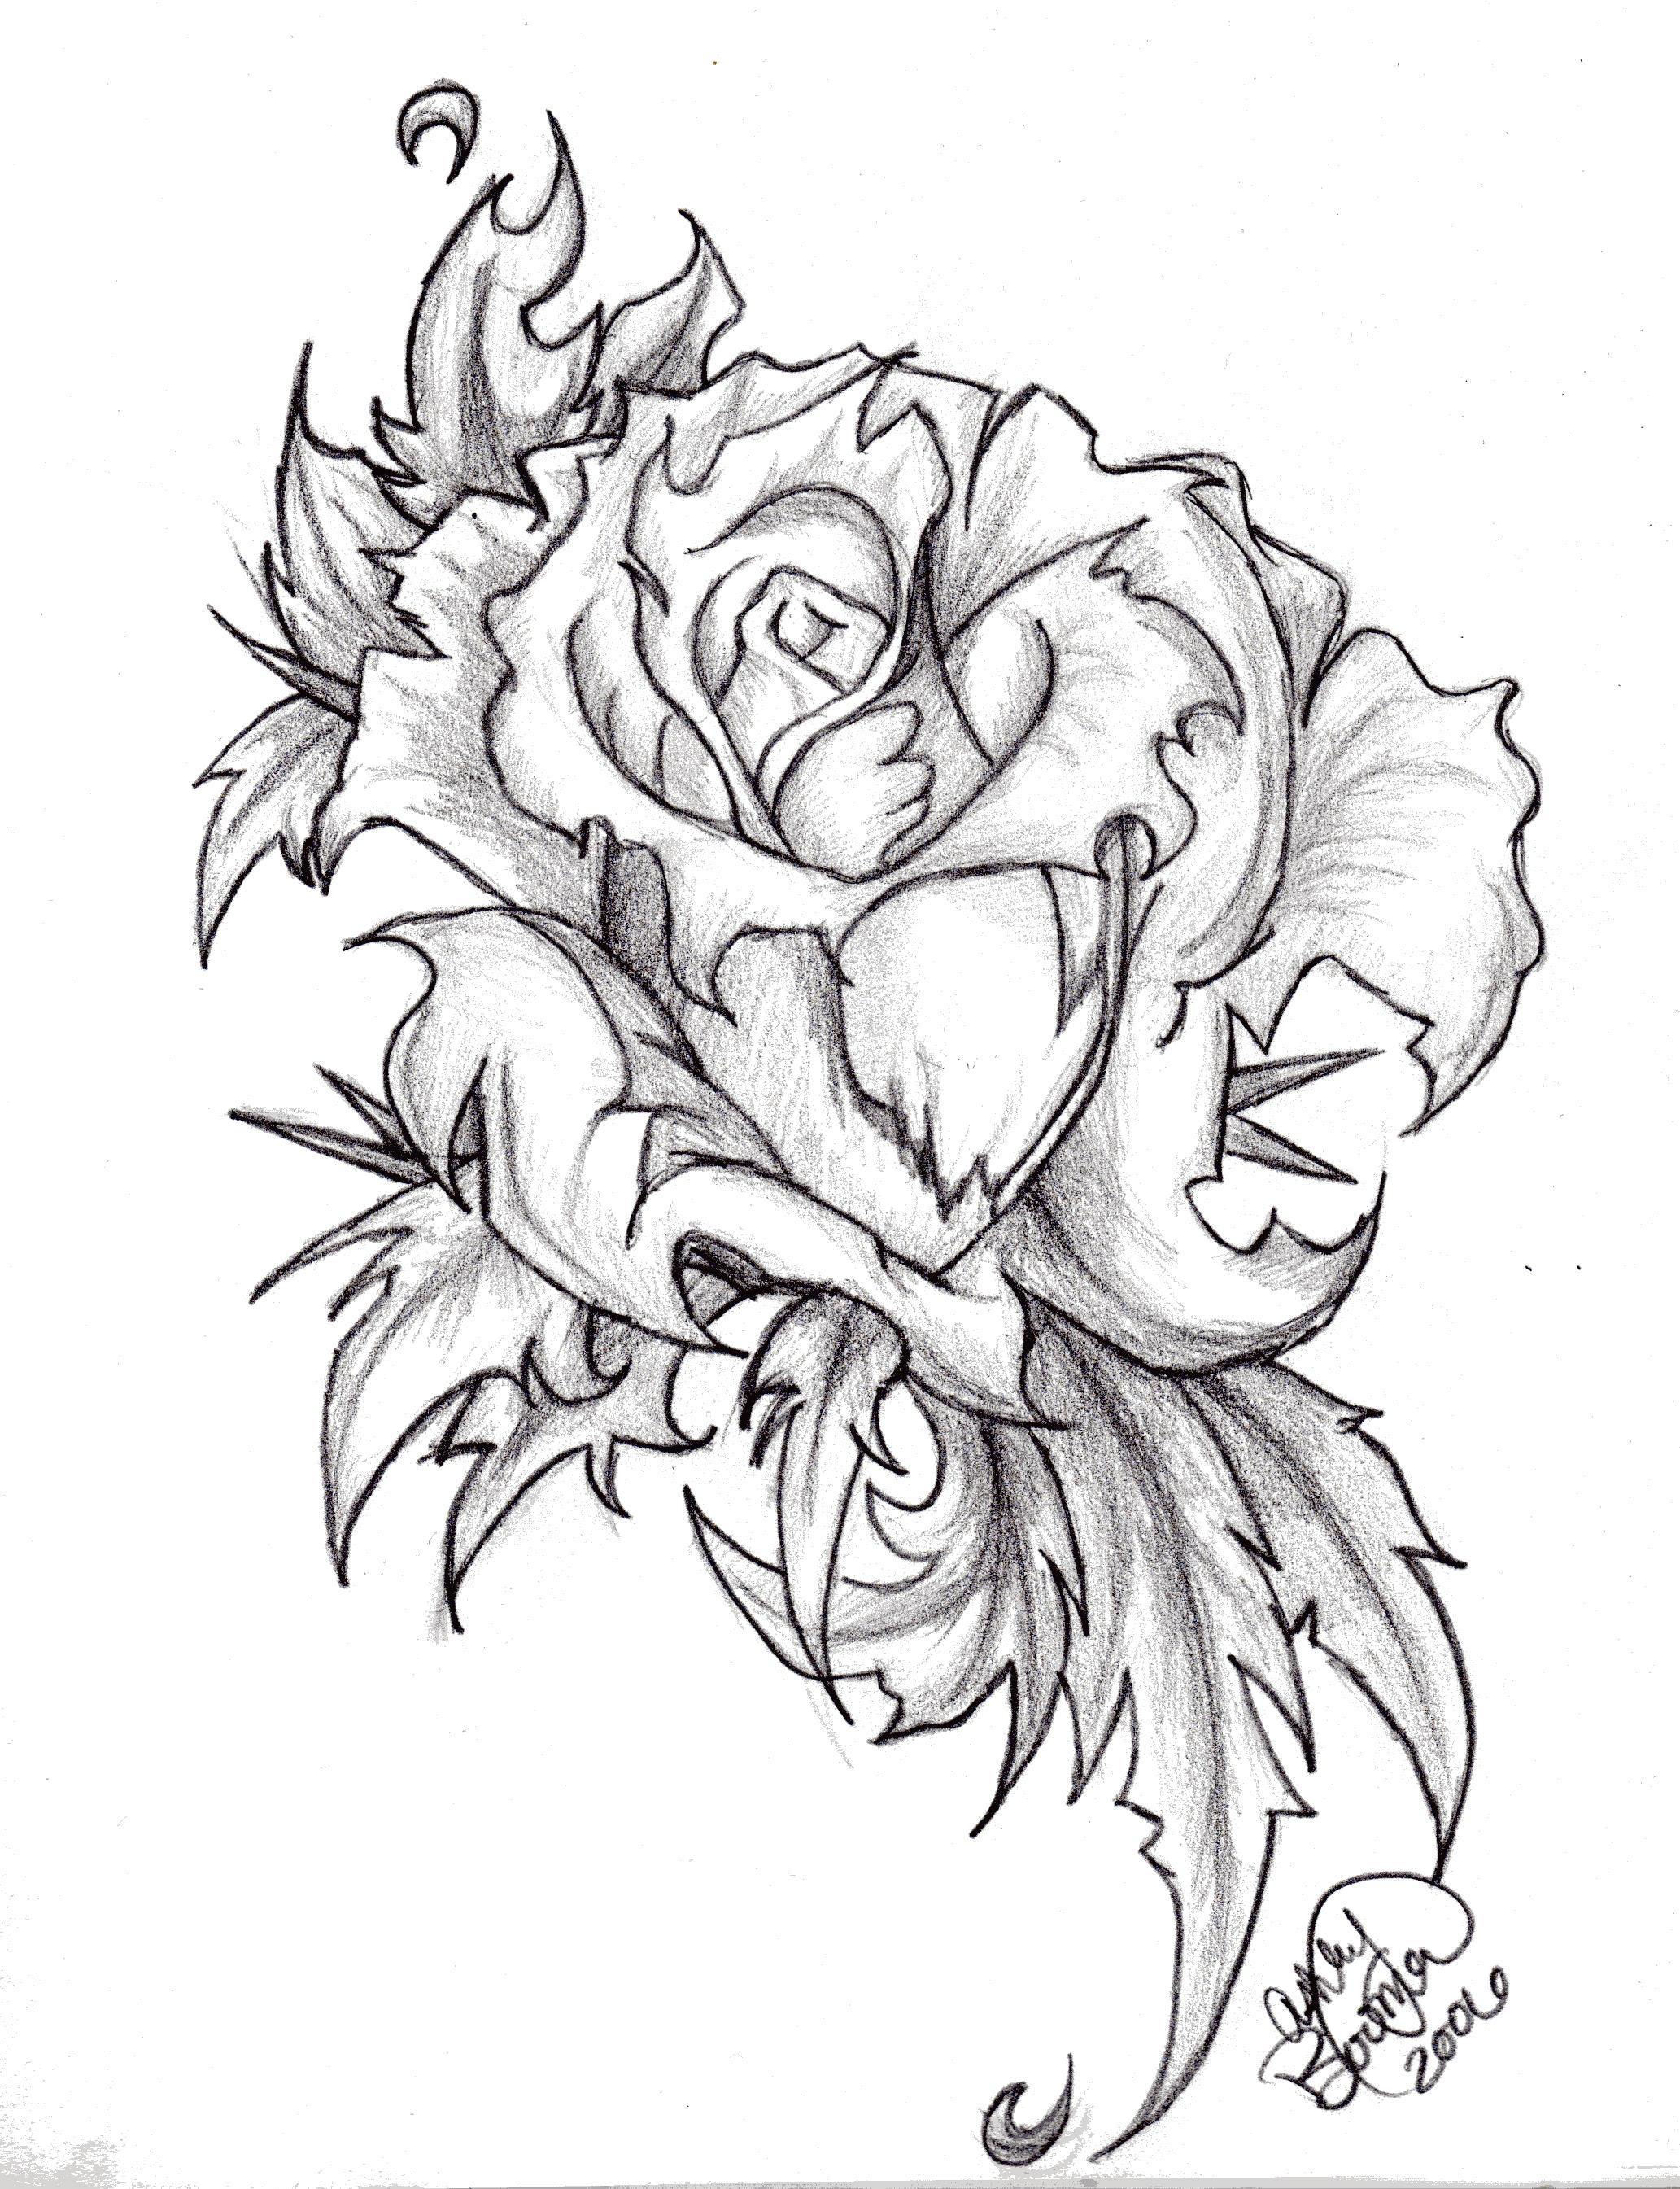 rose by boomboom34 on deviantart Violin Silhouette Clip Art Violin Bow Clip Art